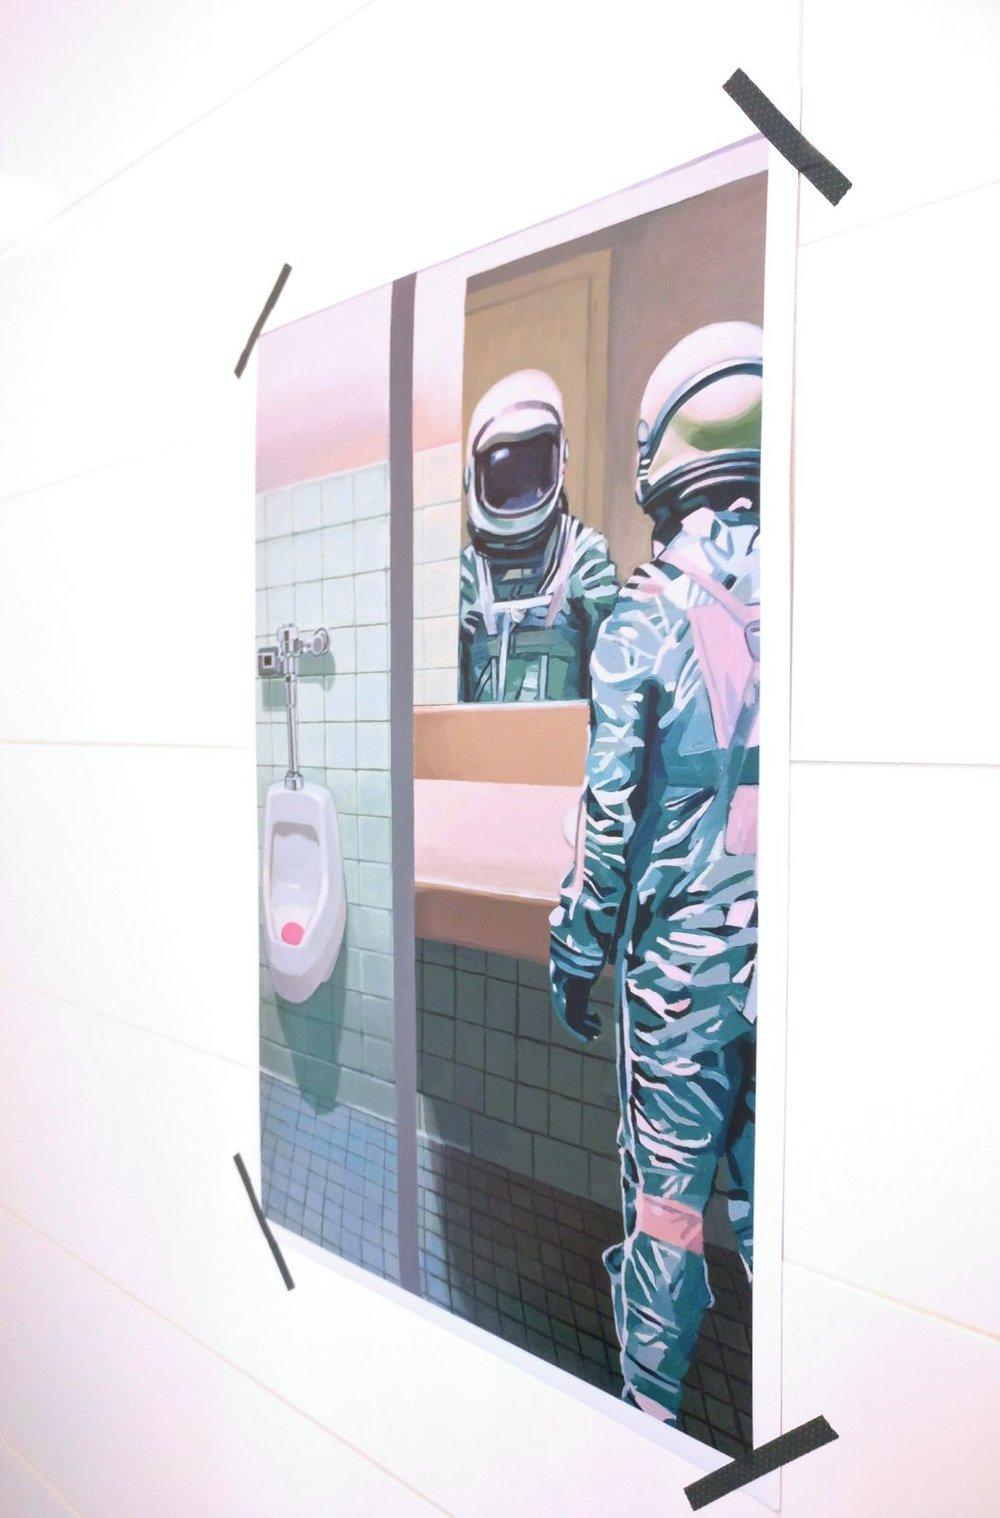 moderne kantoorruimte licht toilet poster.jpg